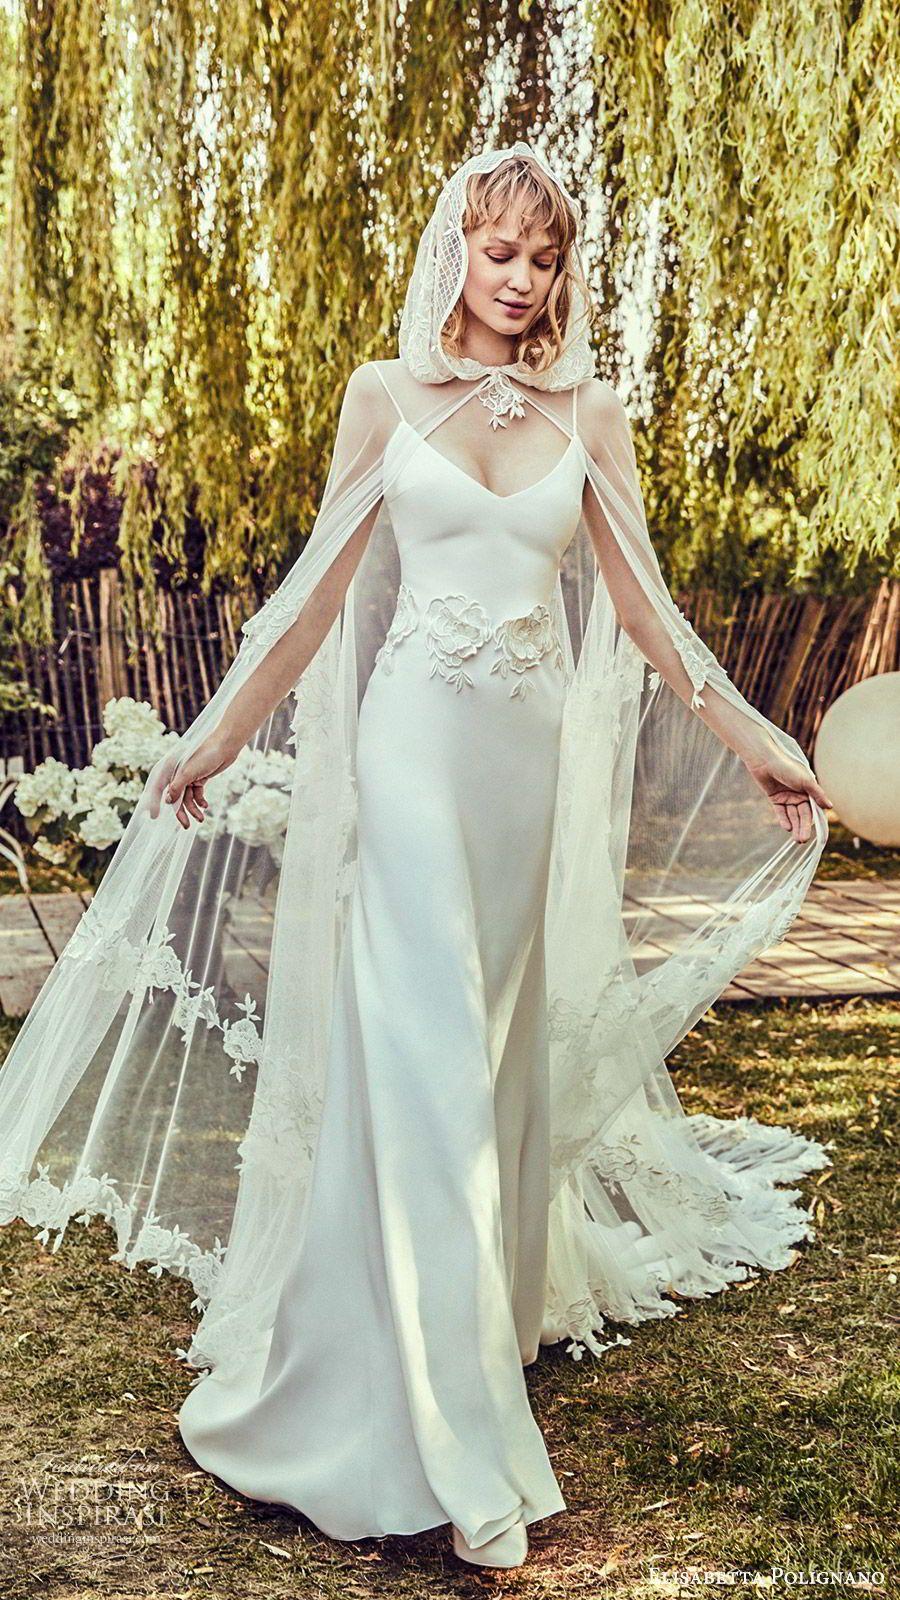 Ep Elisabetta Polignano 2019 Couture Wedding Dresses Wedding Inspirasi Wedding Dress Couture Couture Wedding Cape Wedding Dress